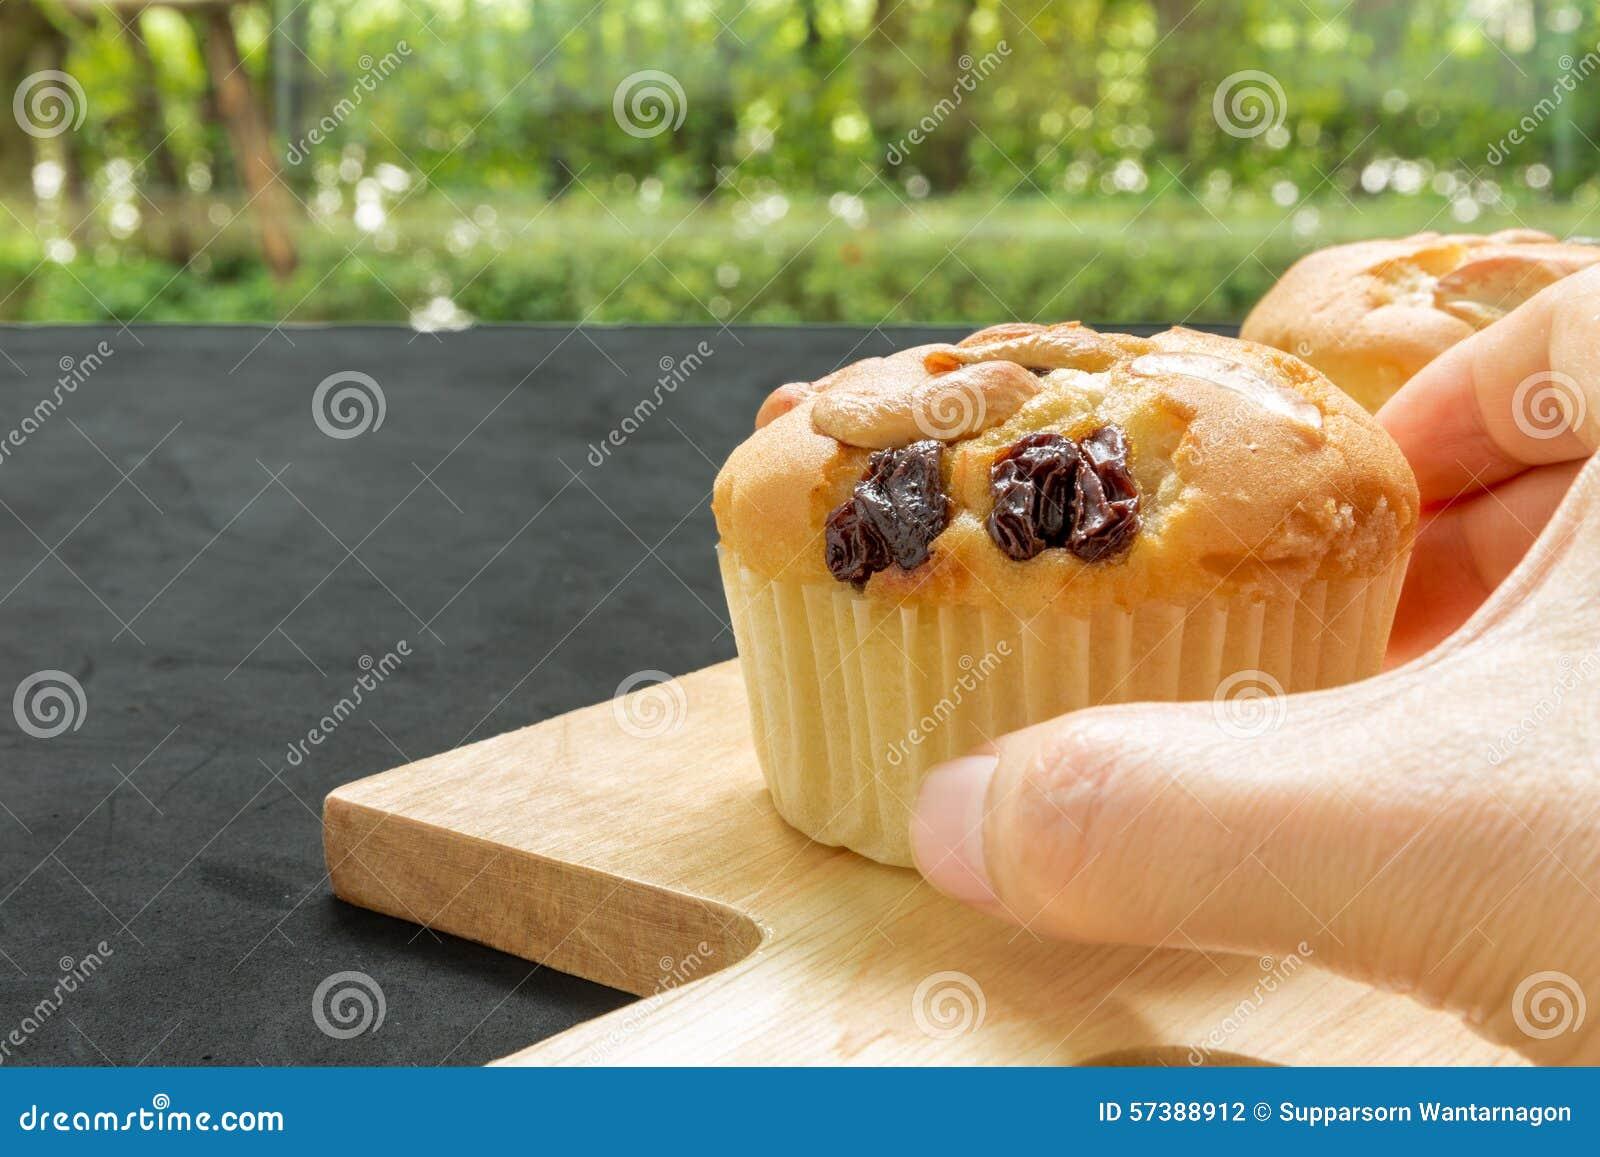 Muffin voor Theepauze/Muffin voor Theepauzeachtergrond